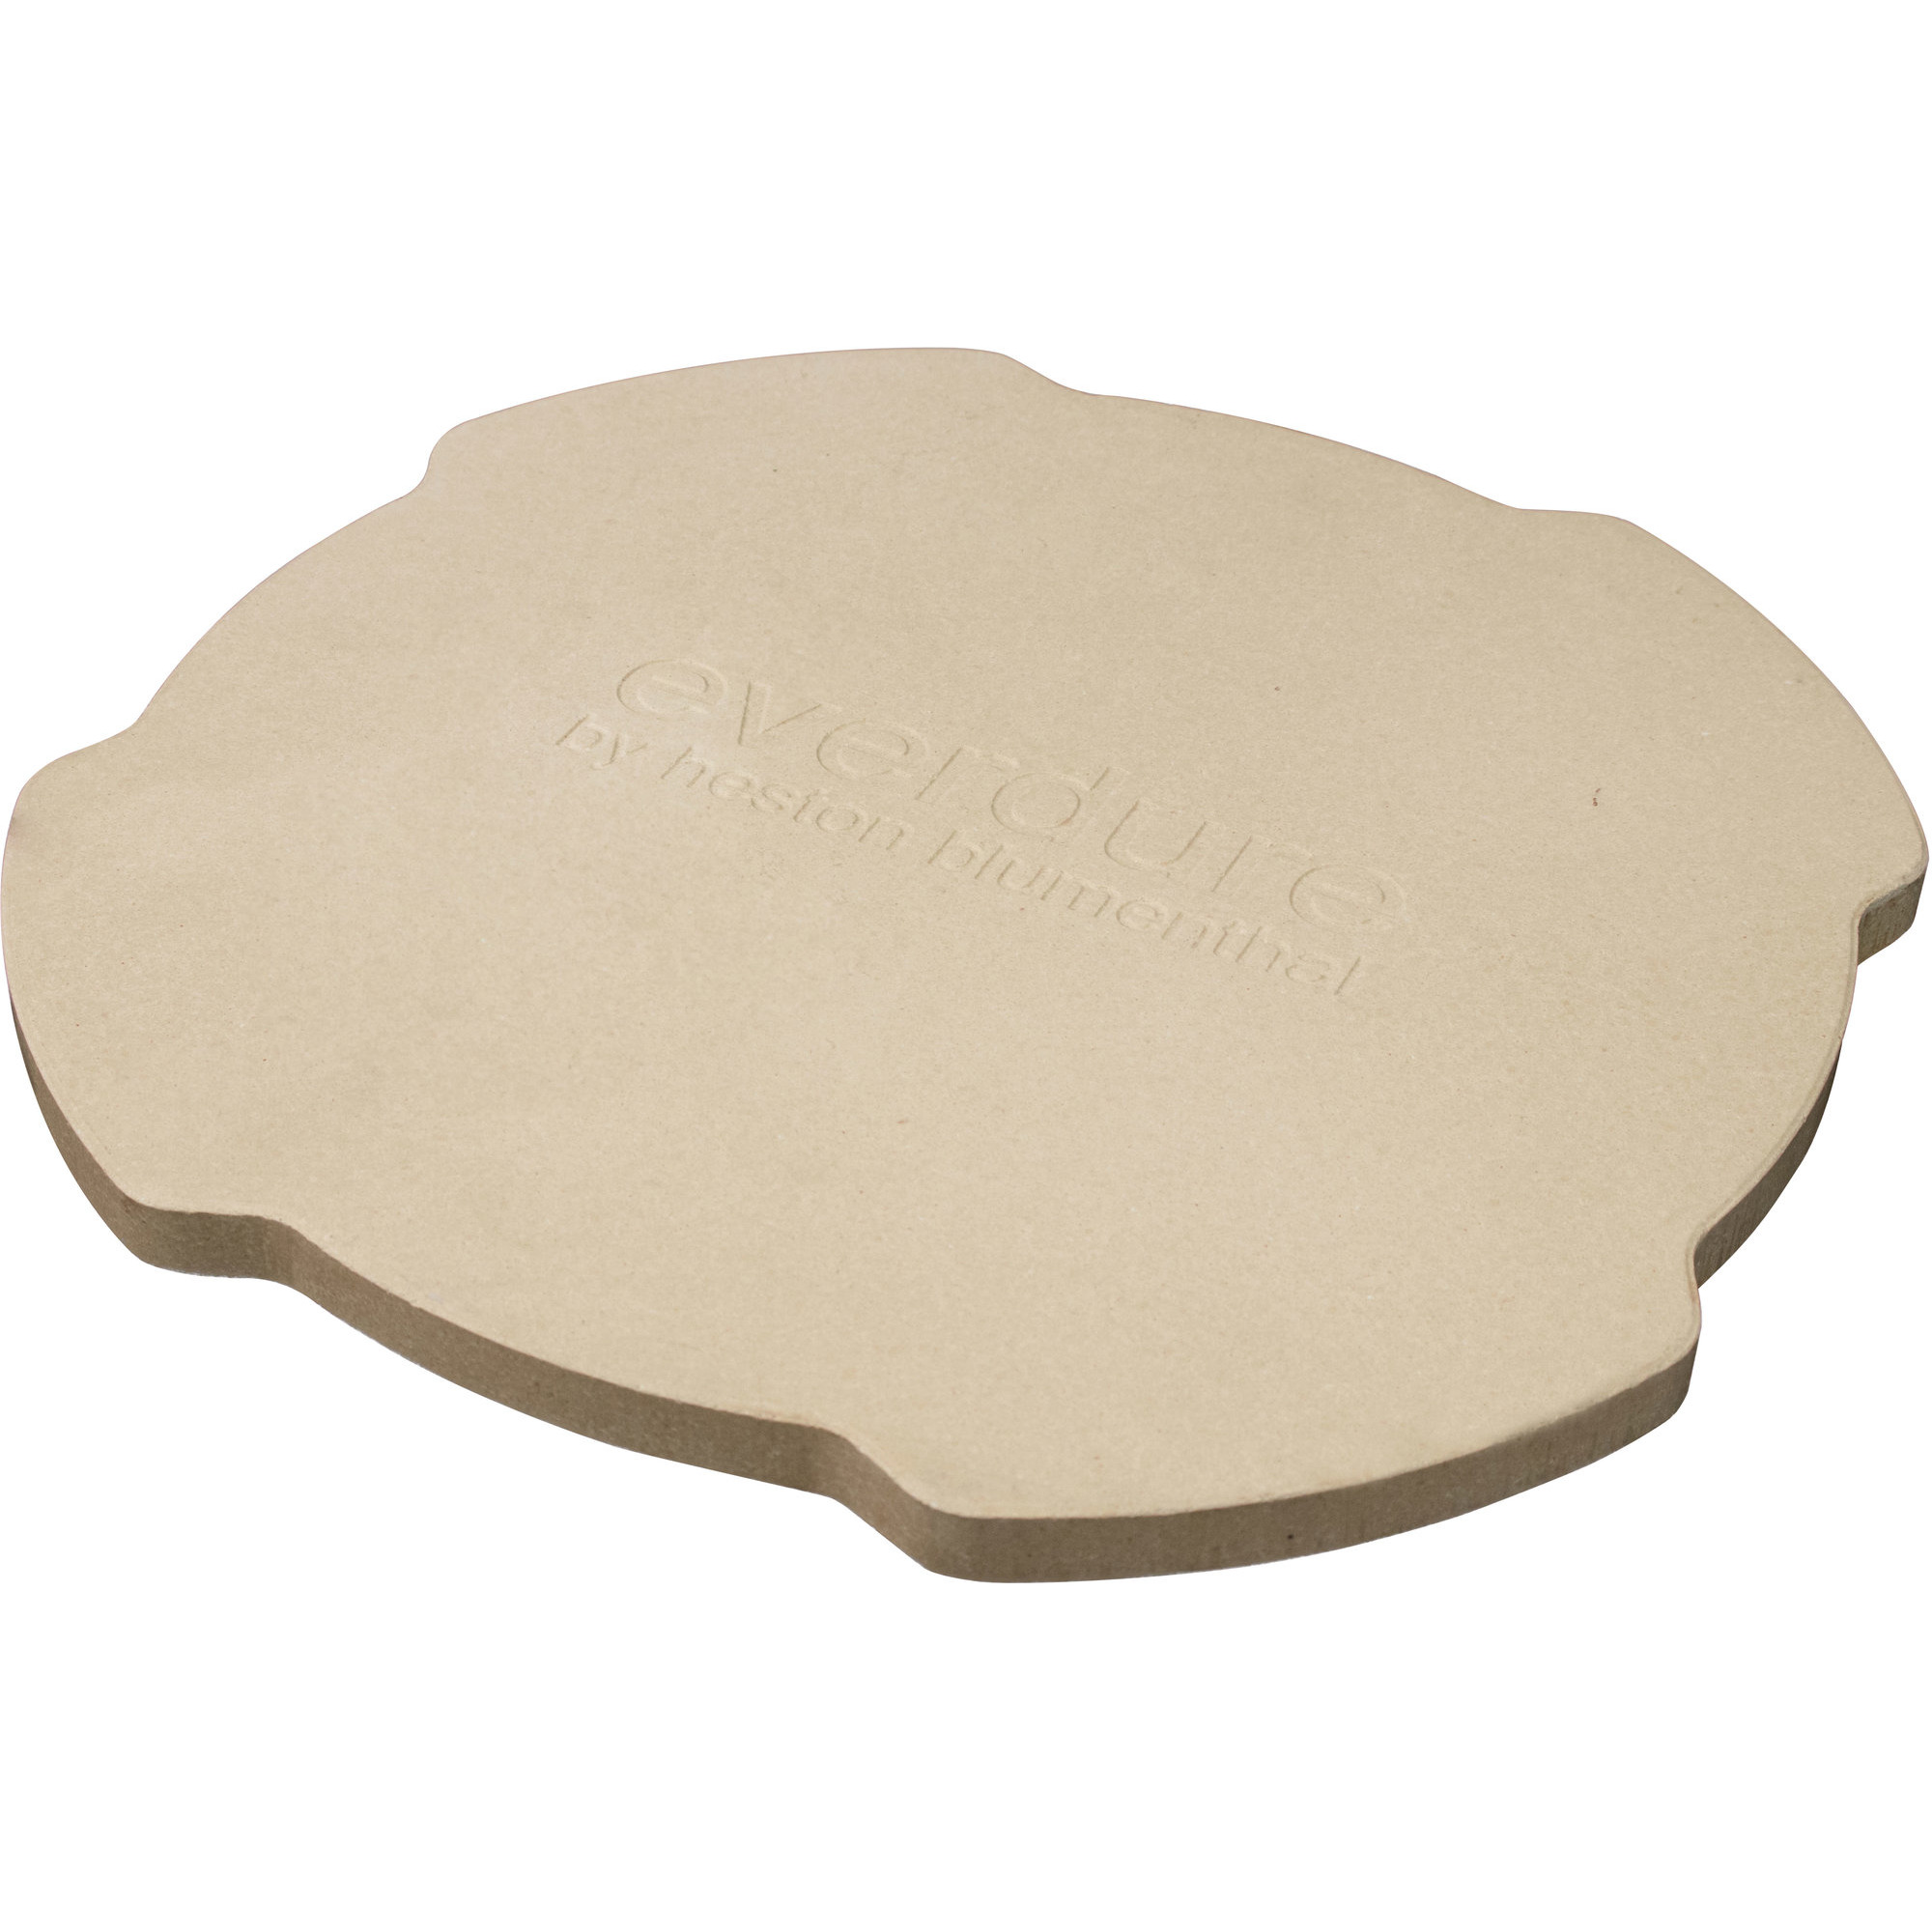 Everdure T-Cordierite Pizza Stone